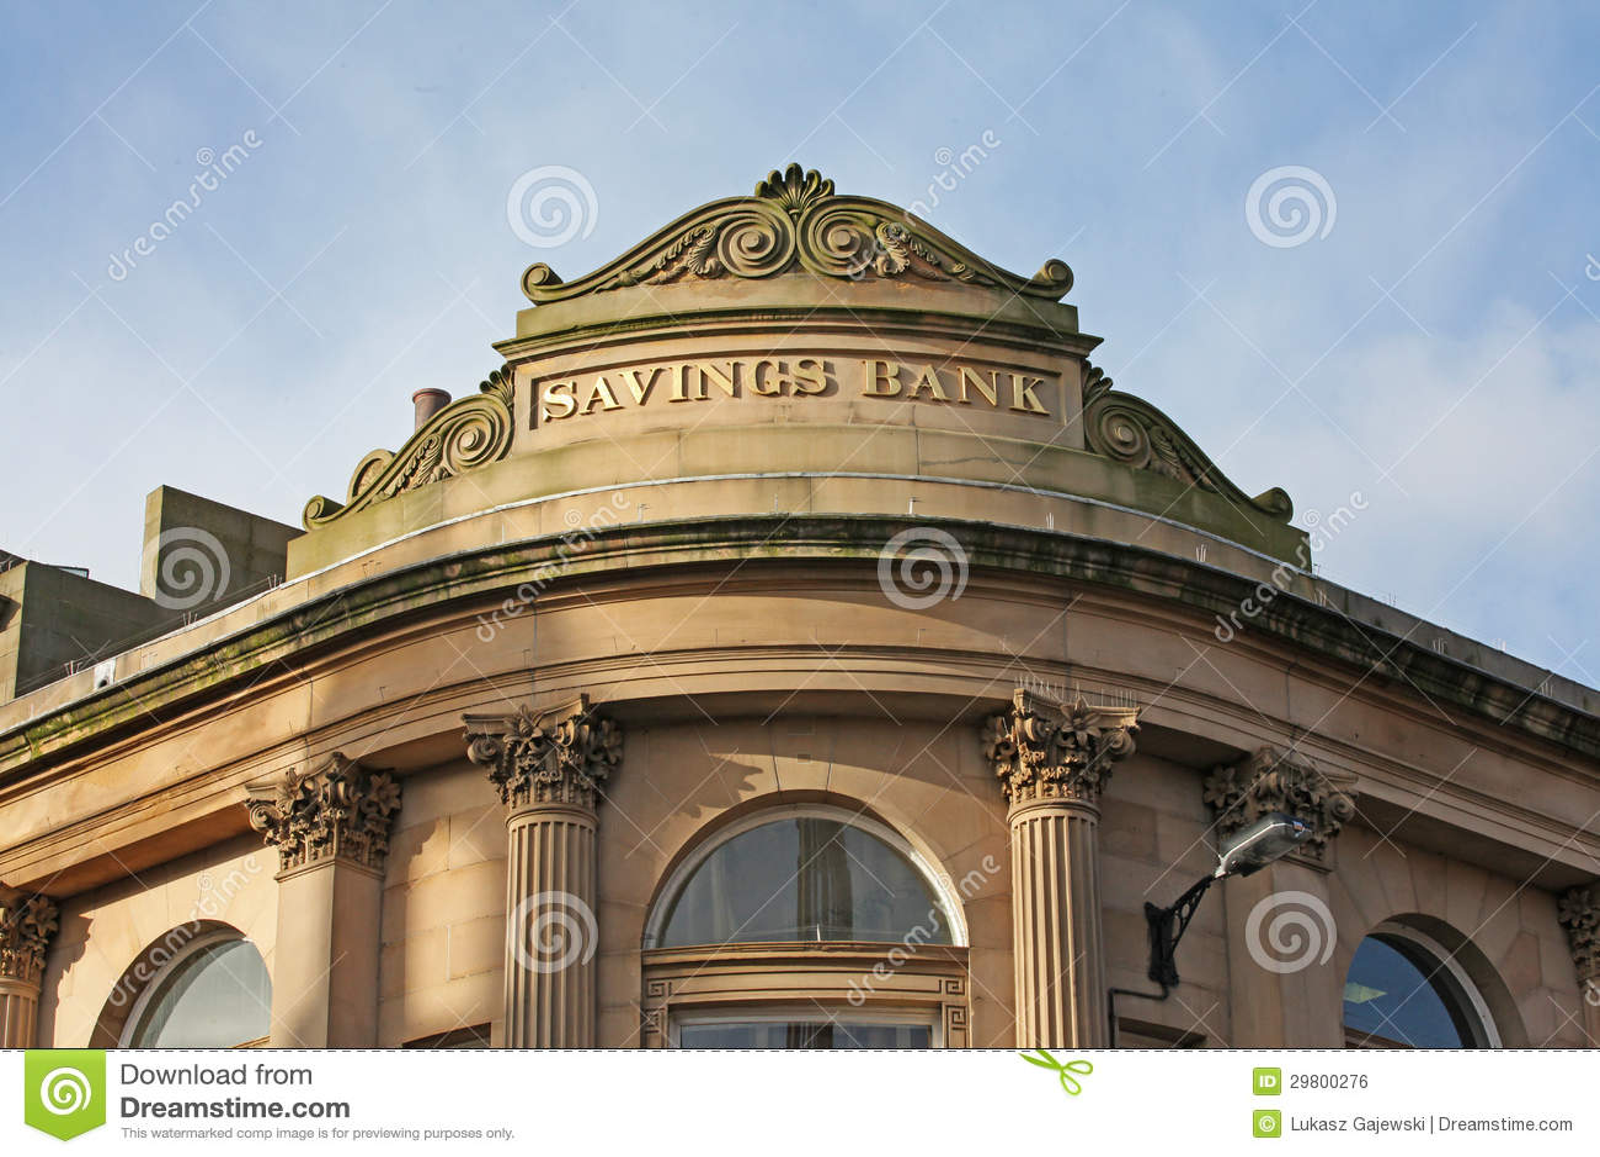 Savings bank royalty free stock image